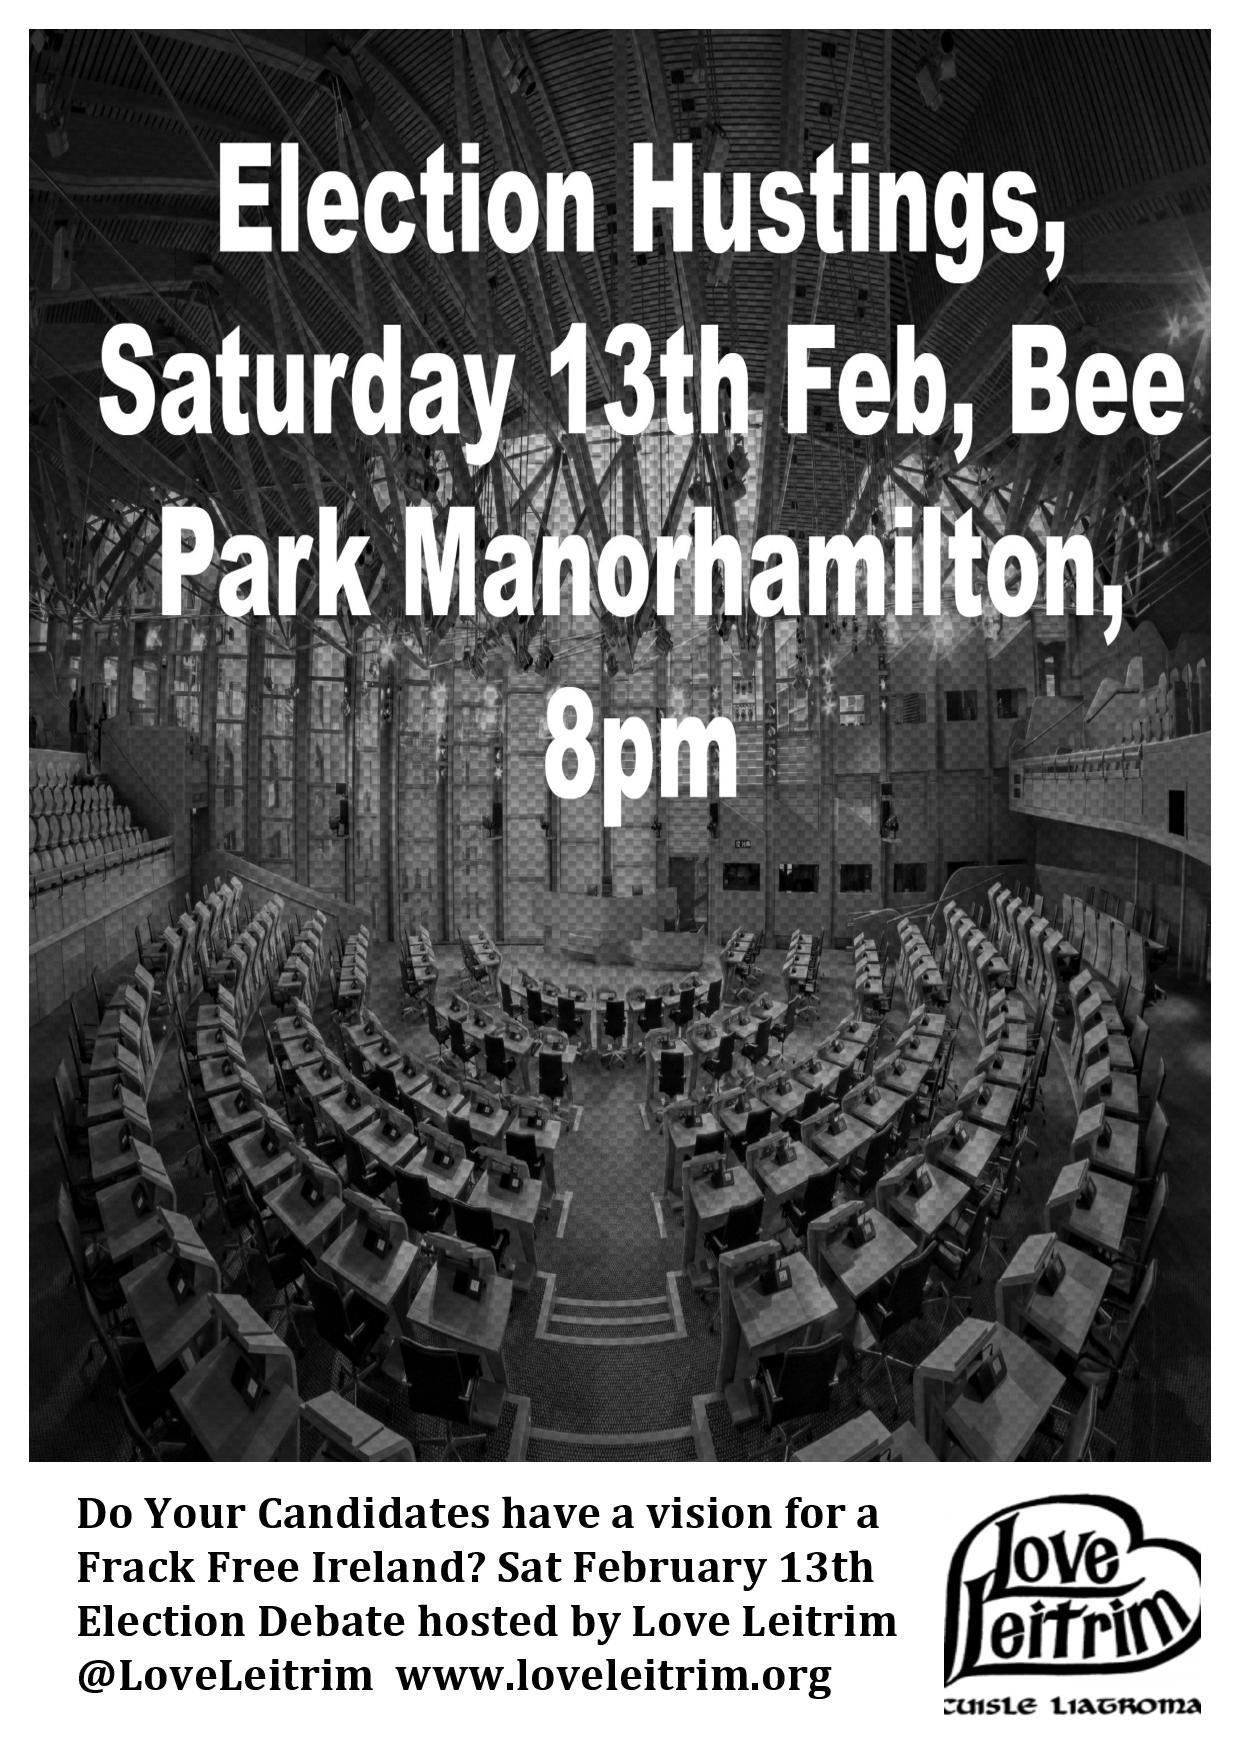 Election Hustings, Saturday 13, BeePark, Manorhamilton